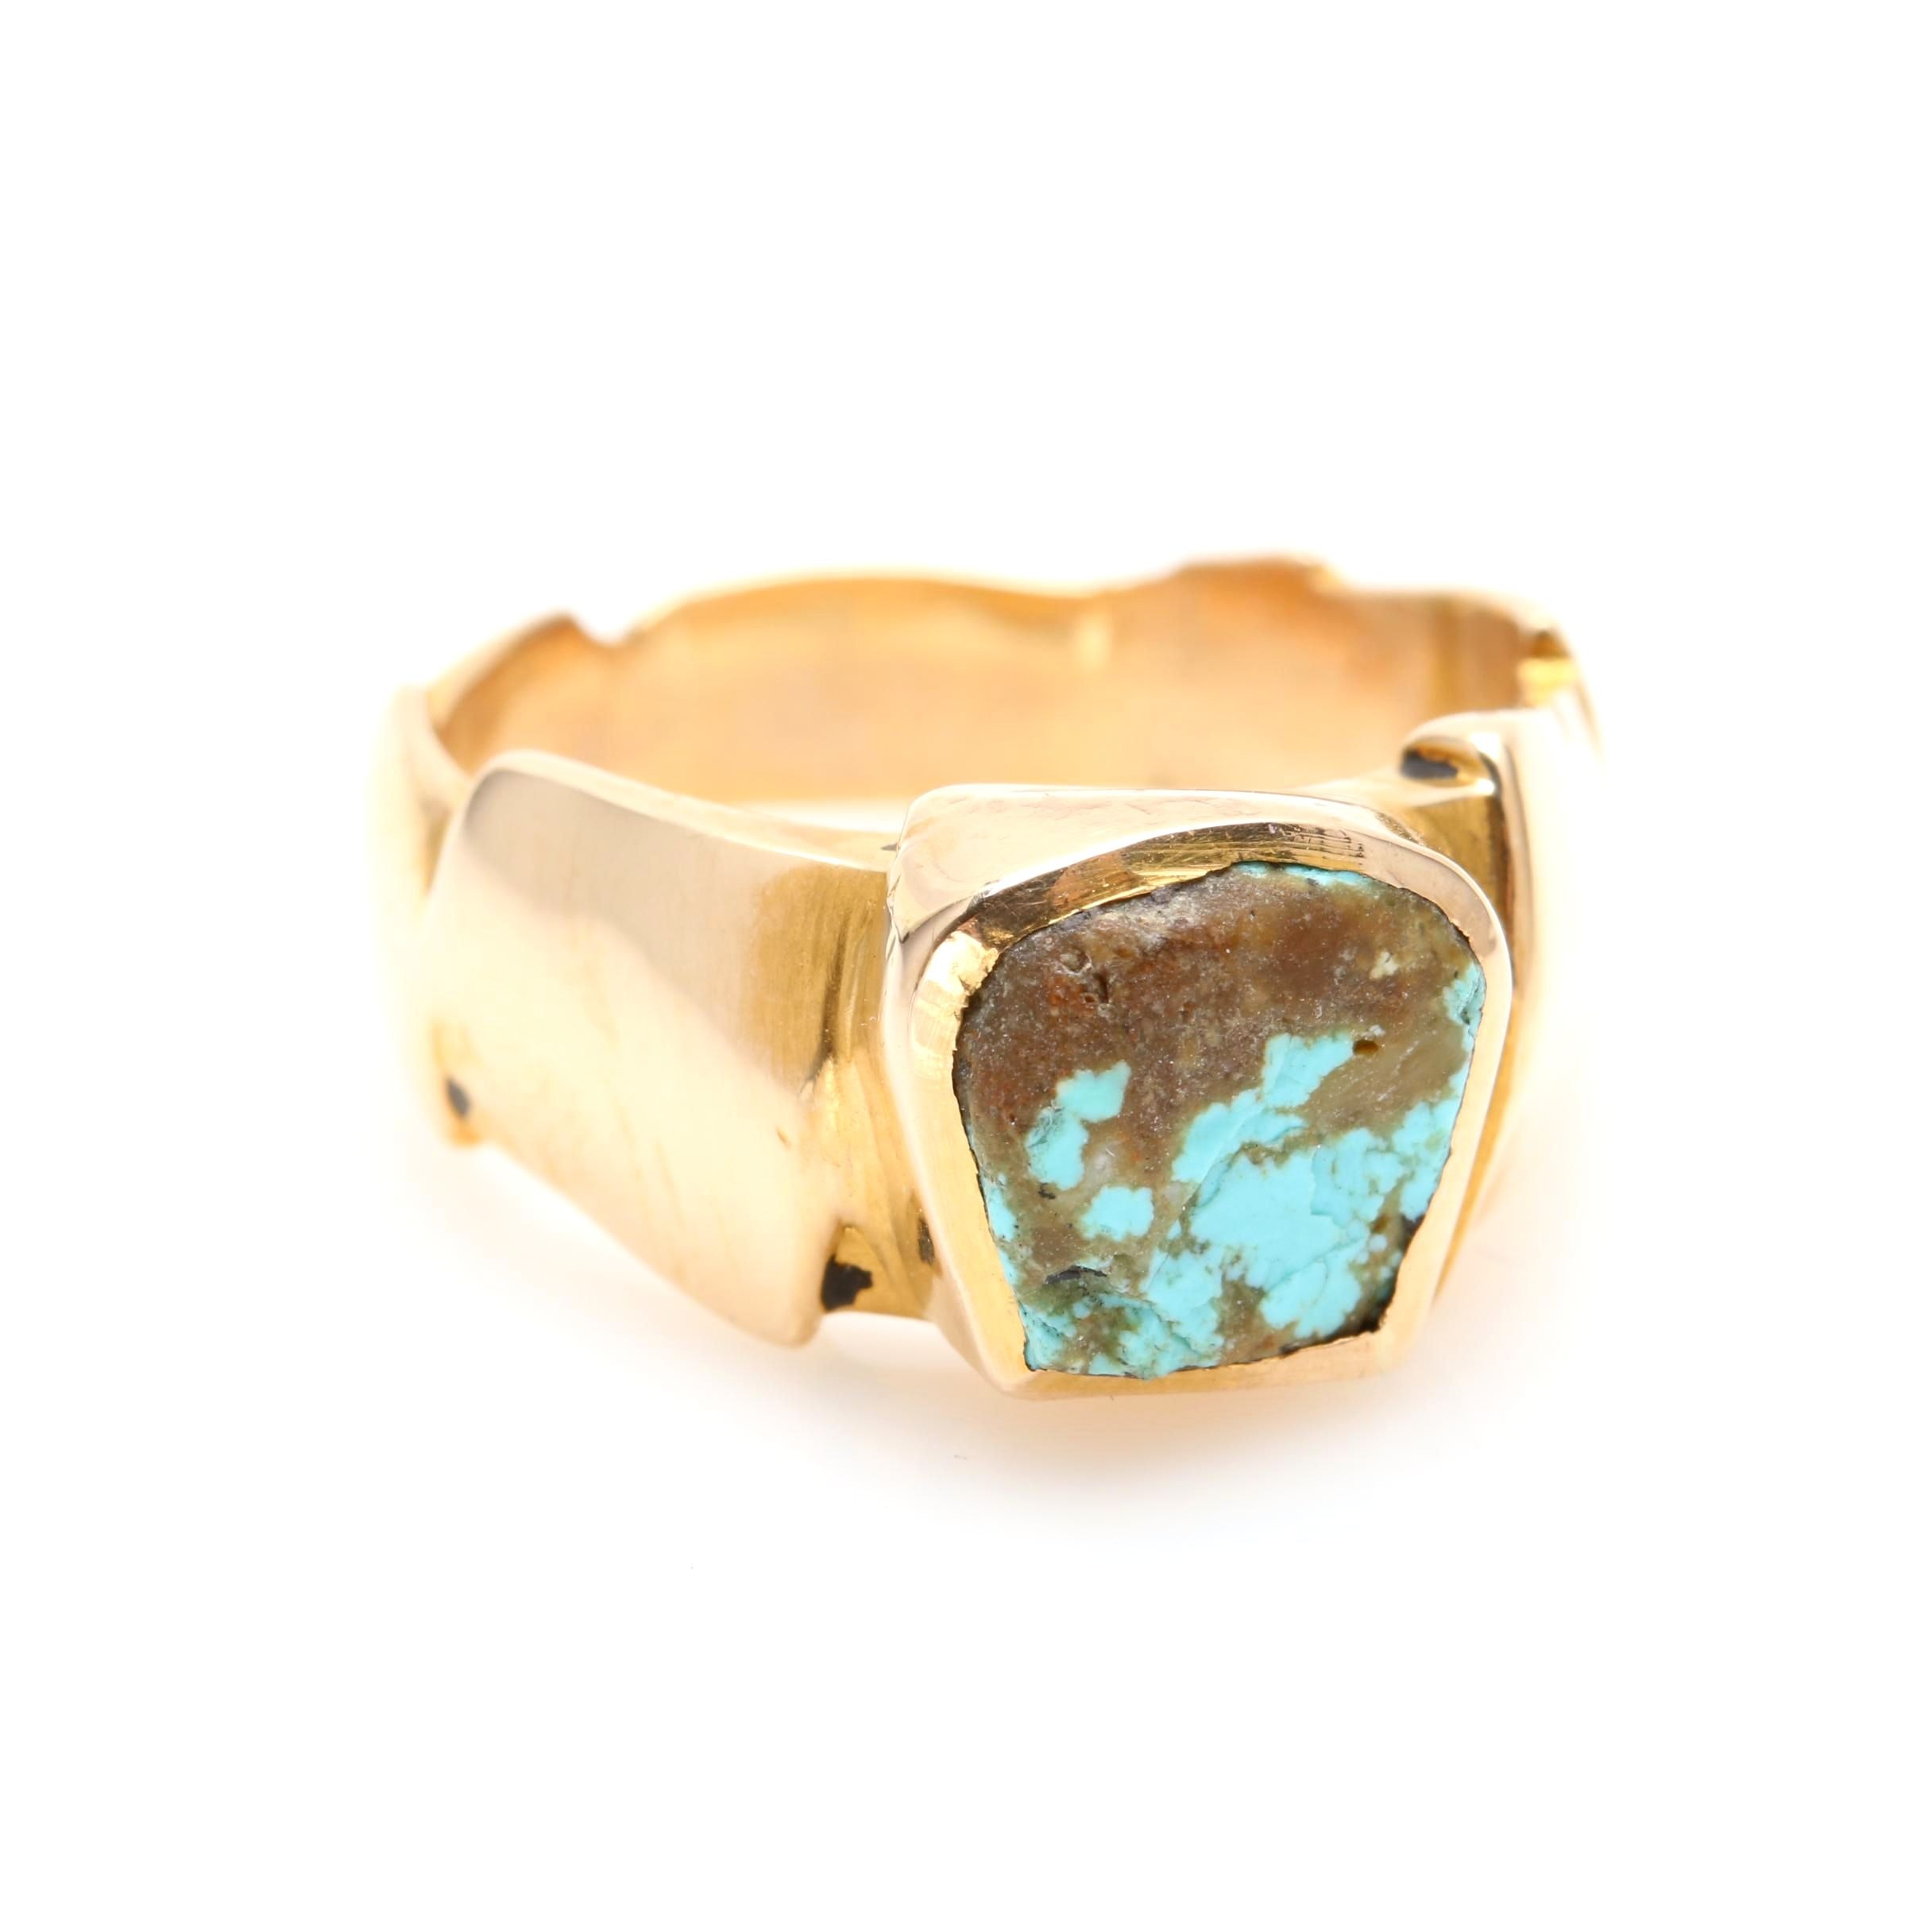 Southwestern Style 14K Yellow Gold Turquoise Ring